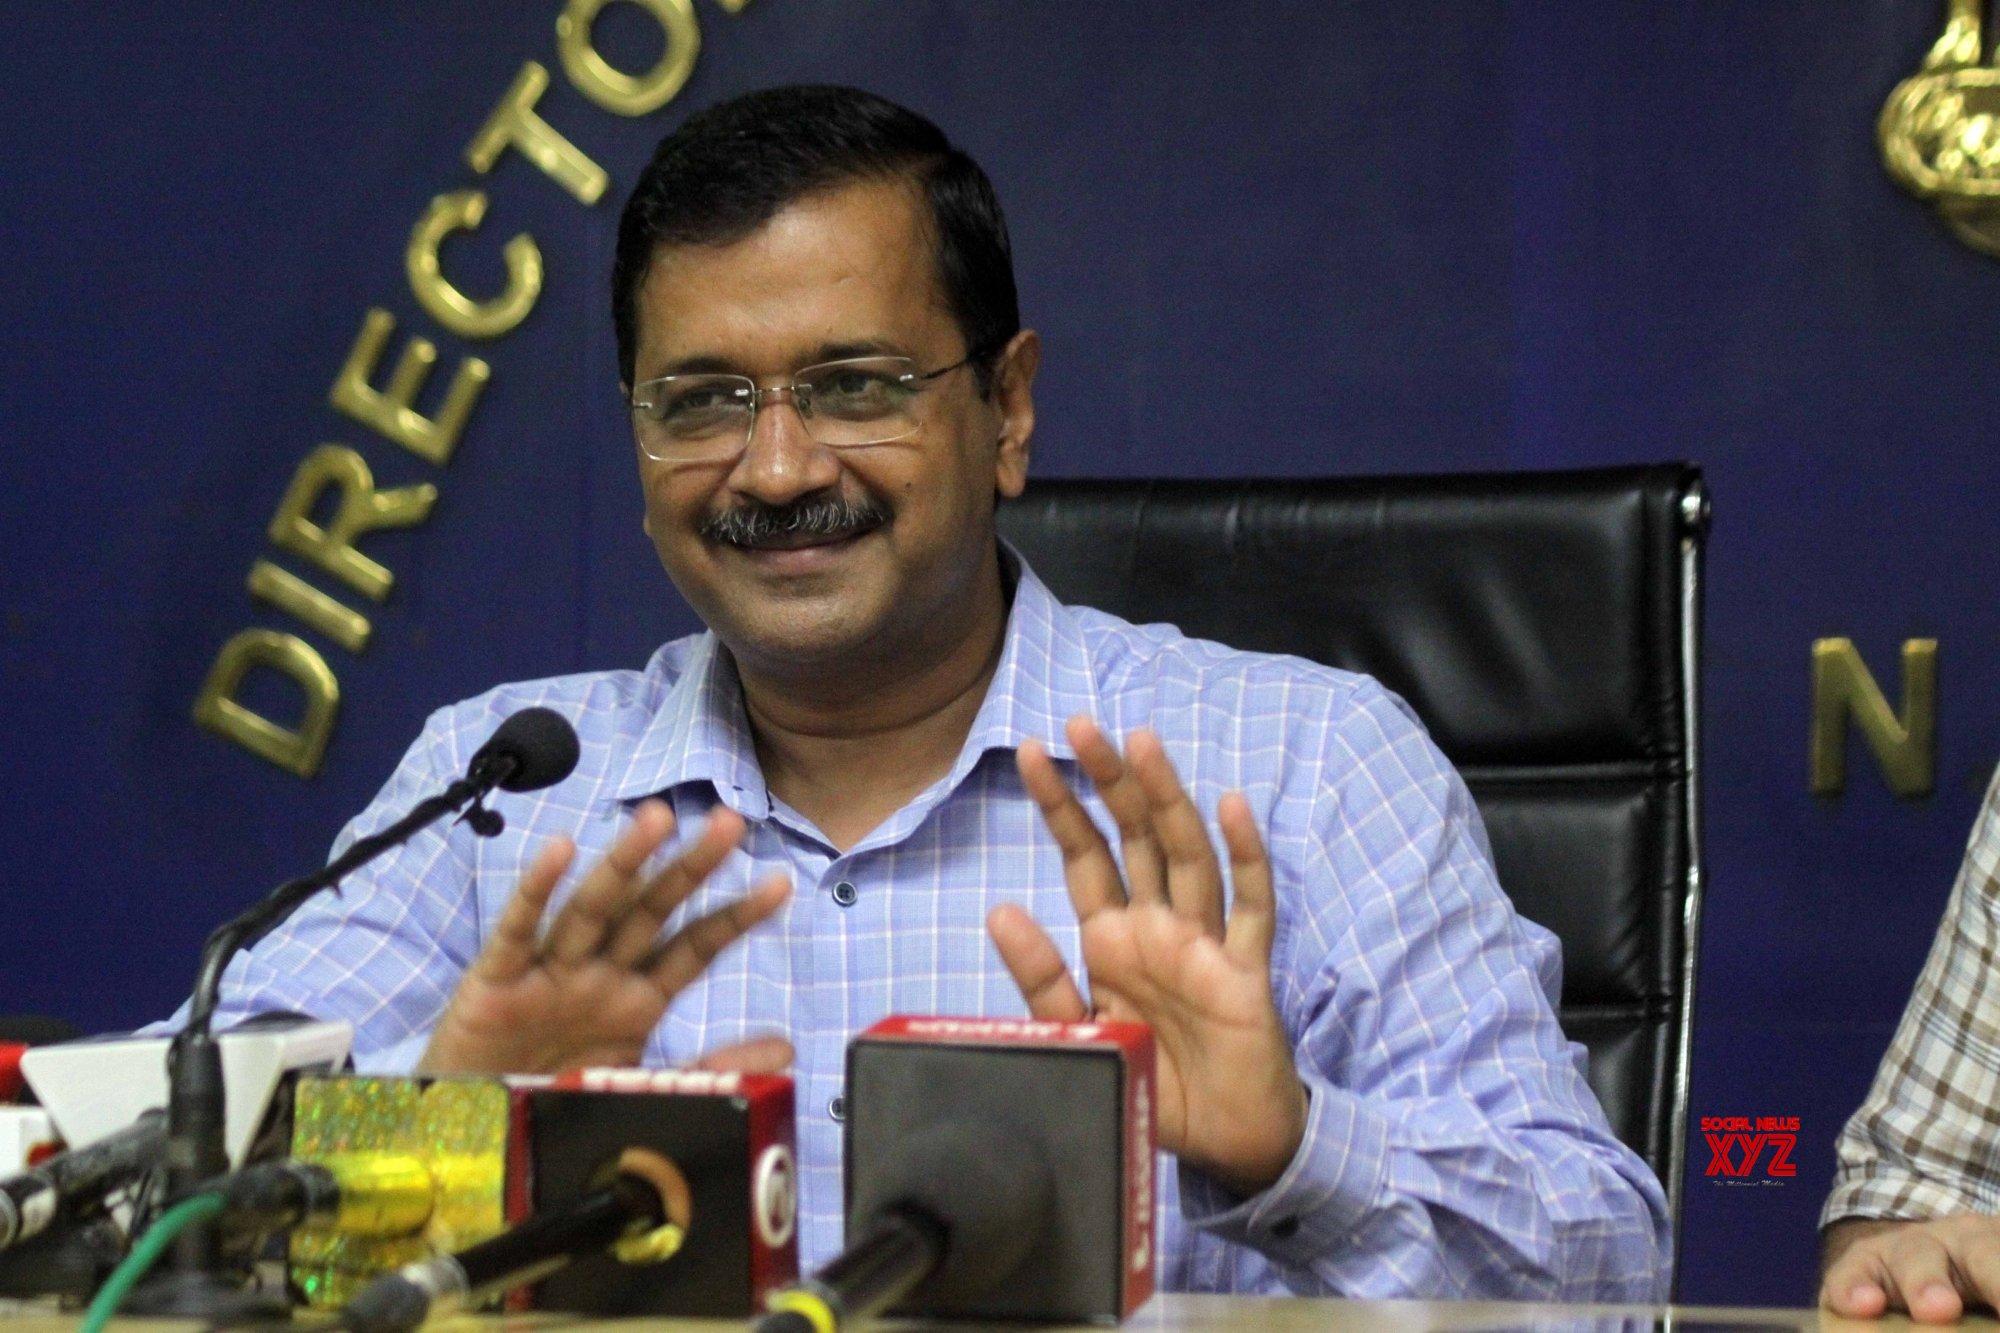 New Delhi: No Odd - Even restriction on November 11,12 #Gallery